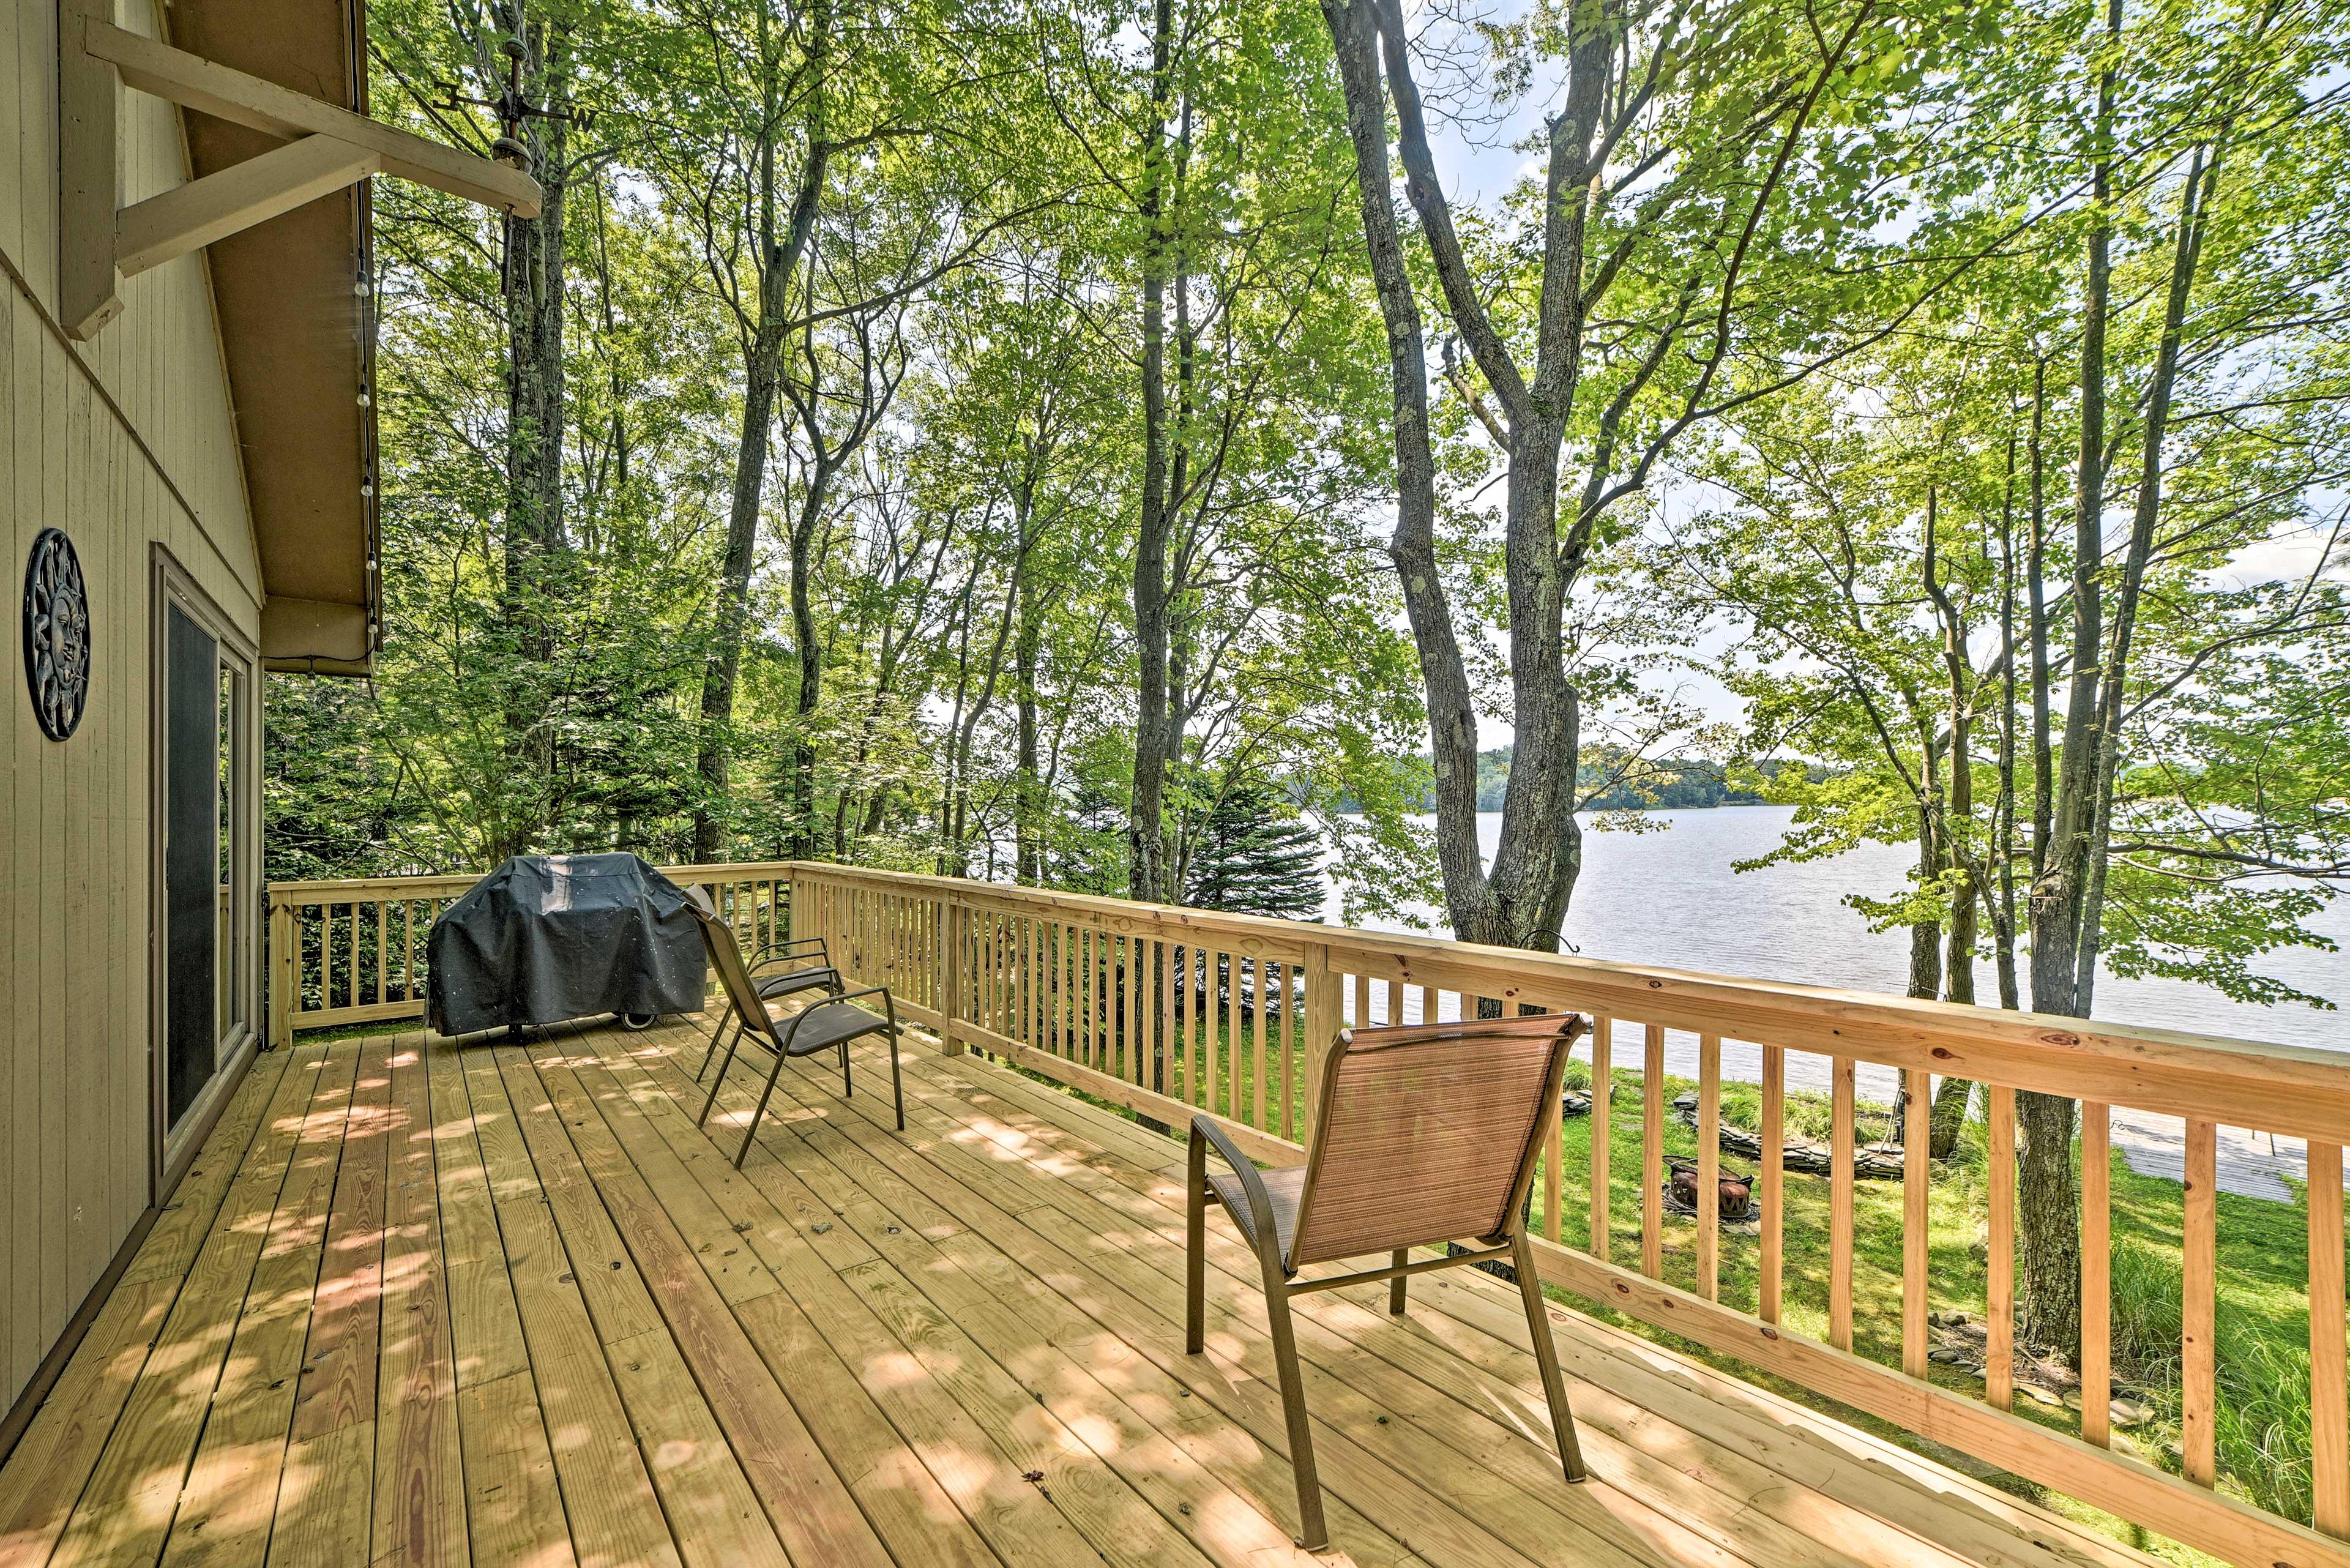 Deck | Gas Grill | Lake Views | Step-Free Access